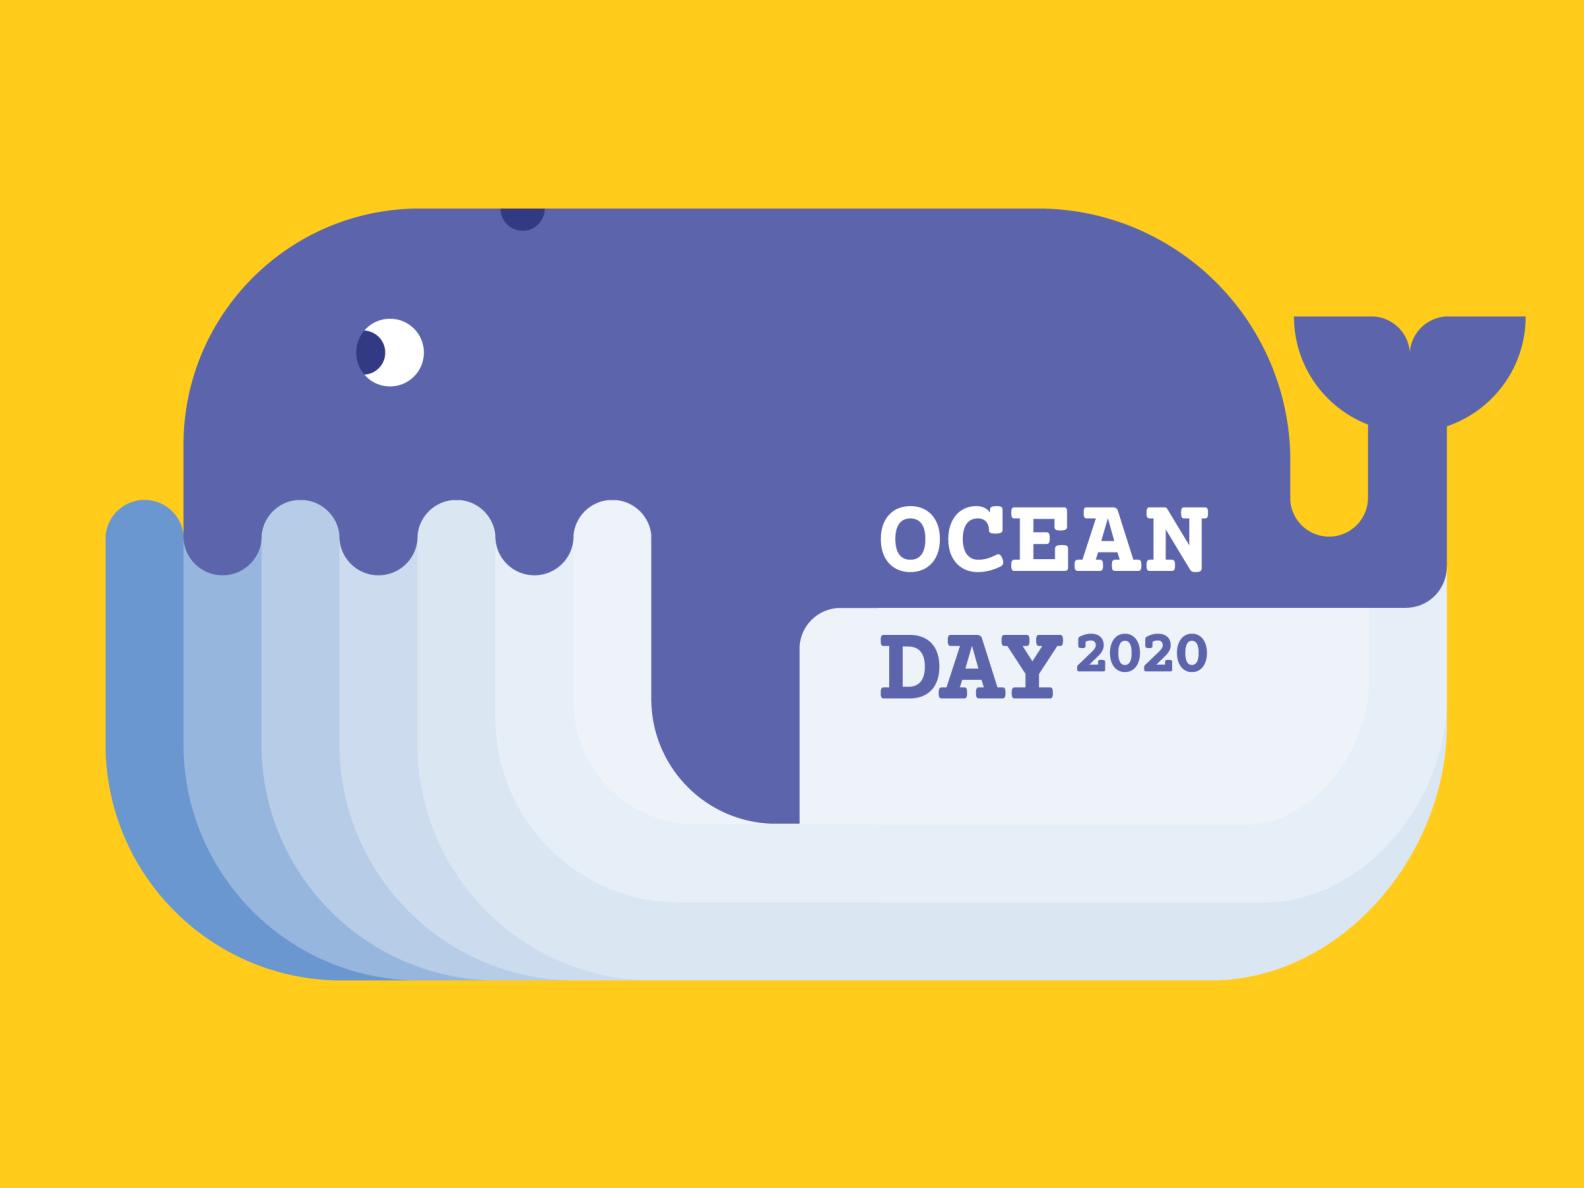 OCEANS DAY 2020